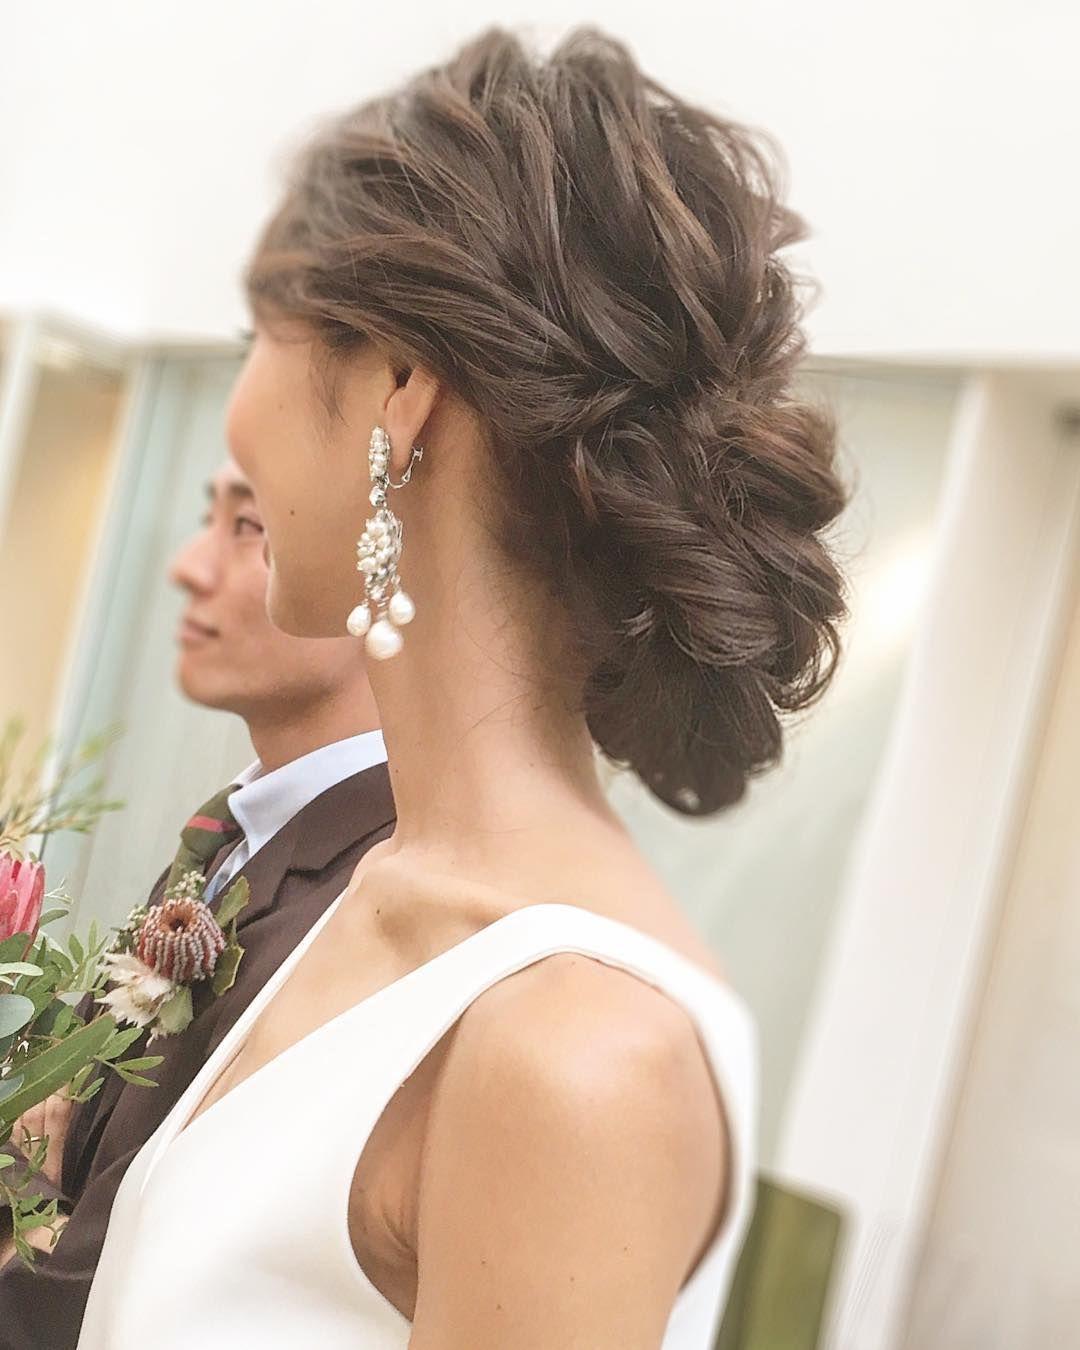 Weddinghair ウェディングヘア 低めシニヨン Wedding Hairstyles